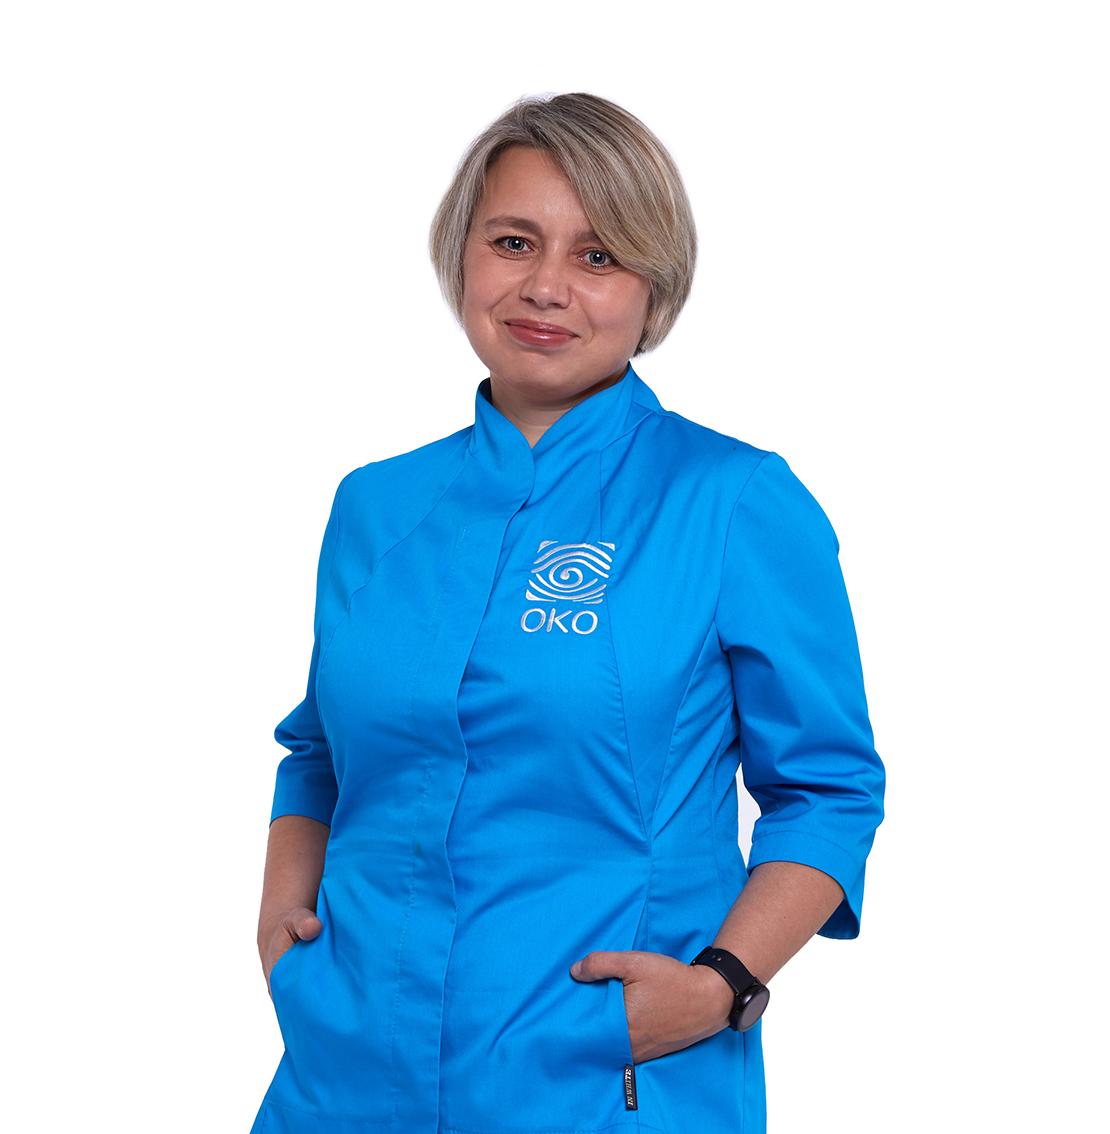 офтальмолог Оксана Дмитриевна Елисина